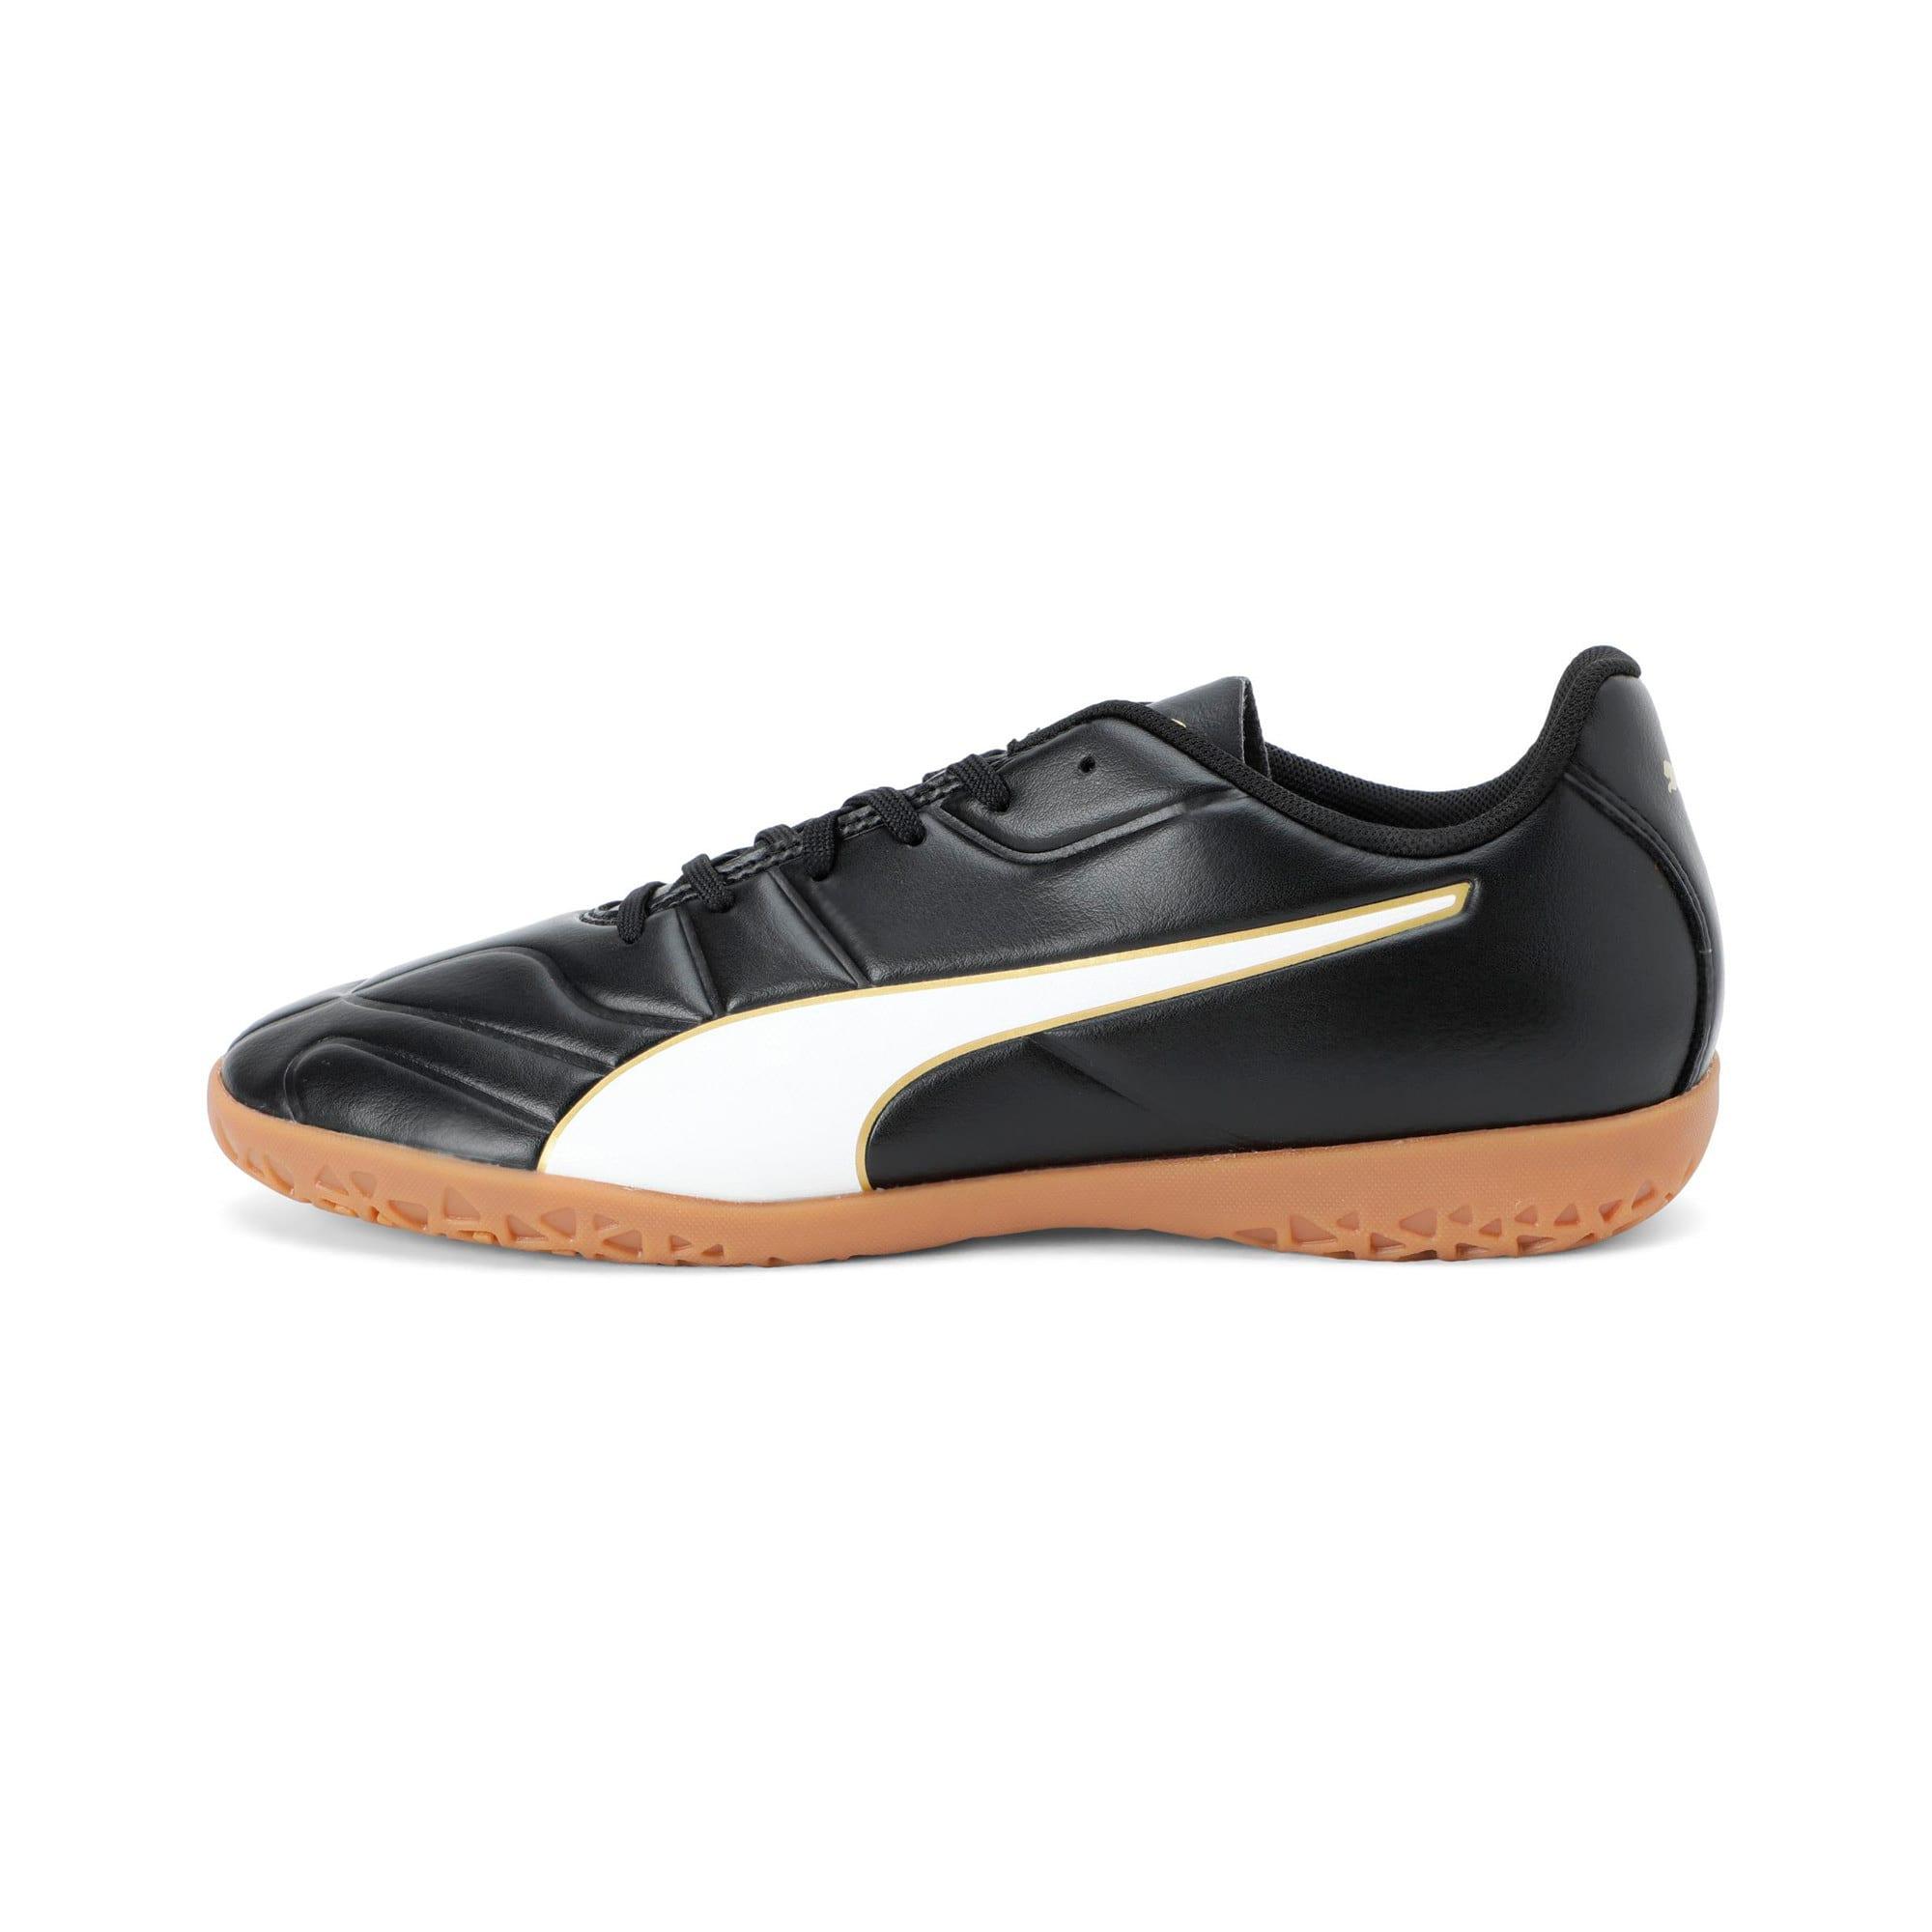 Thumbnail 1 of Classico C II Men's Football Boots, Puma Black-Puma White-Gold, medium-IND